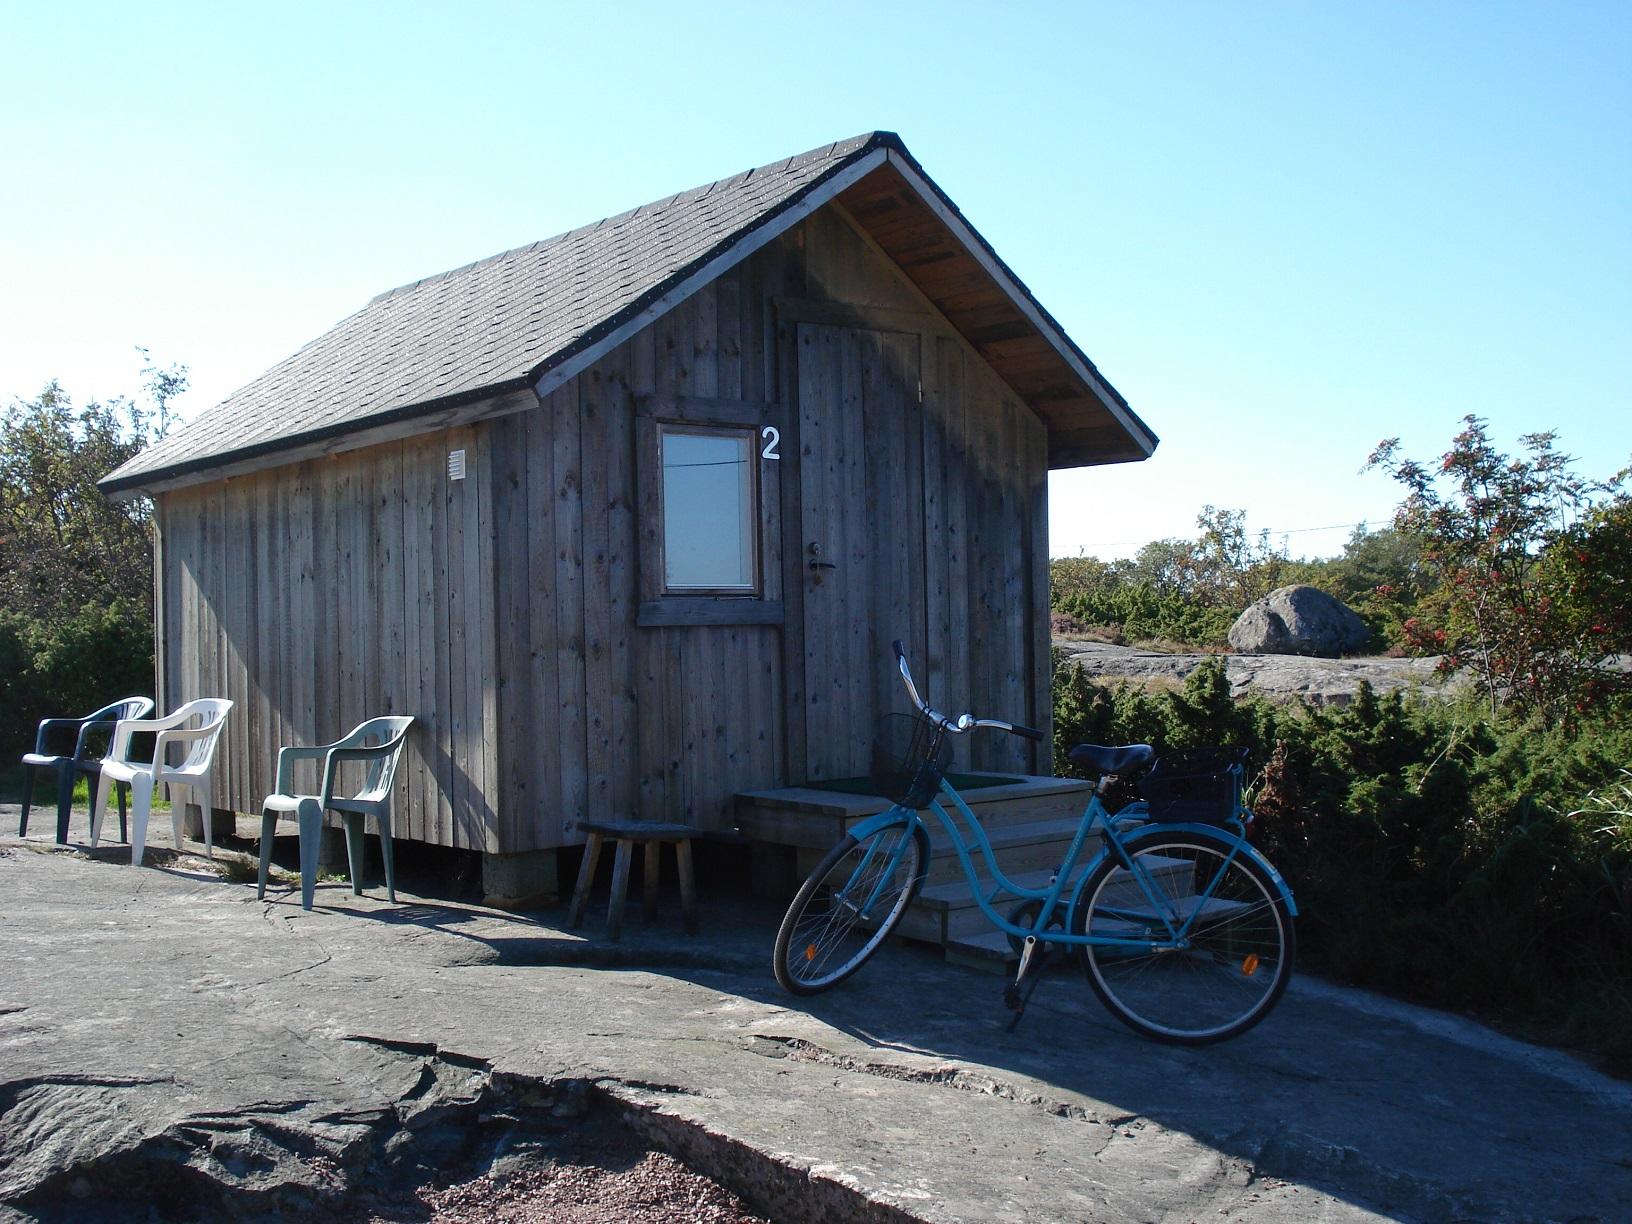 Hütte auf Kökar, Aland-Inseln